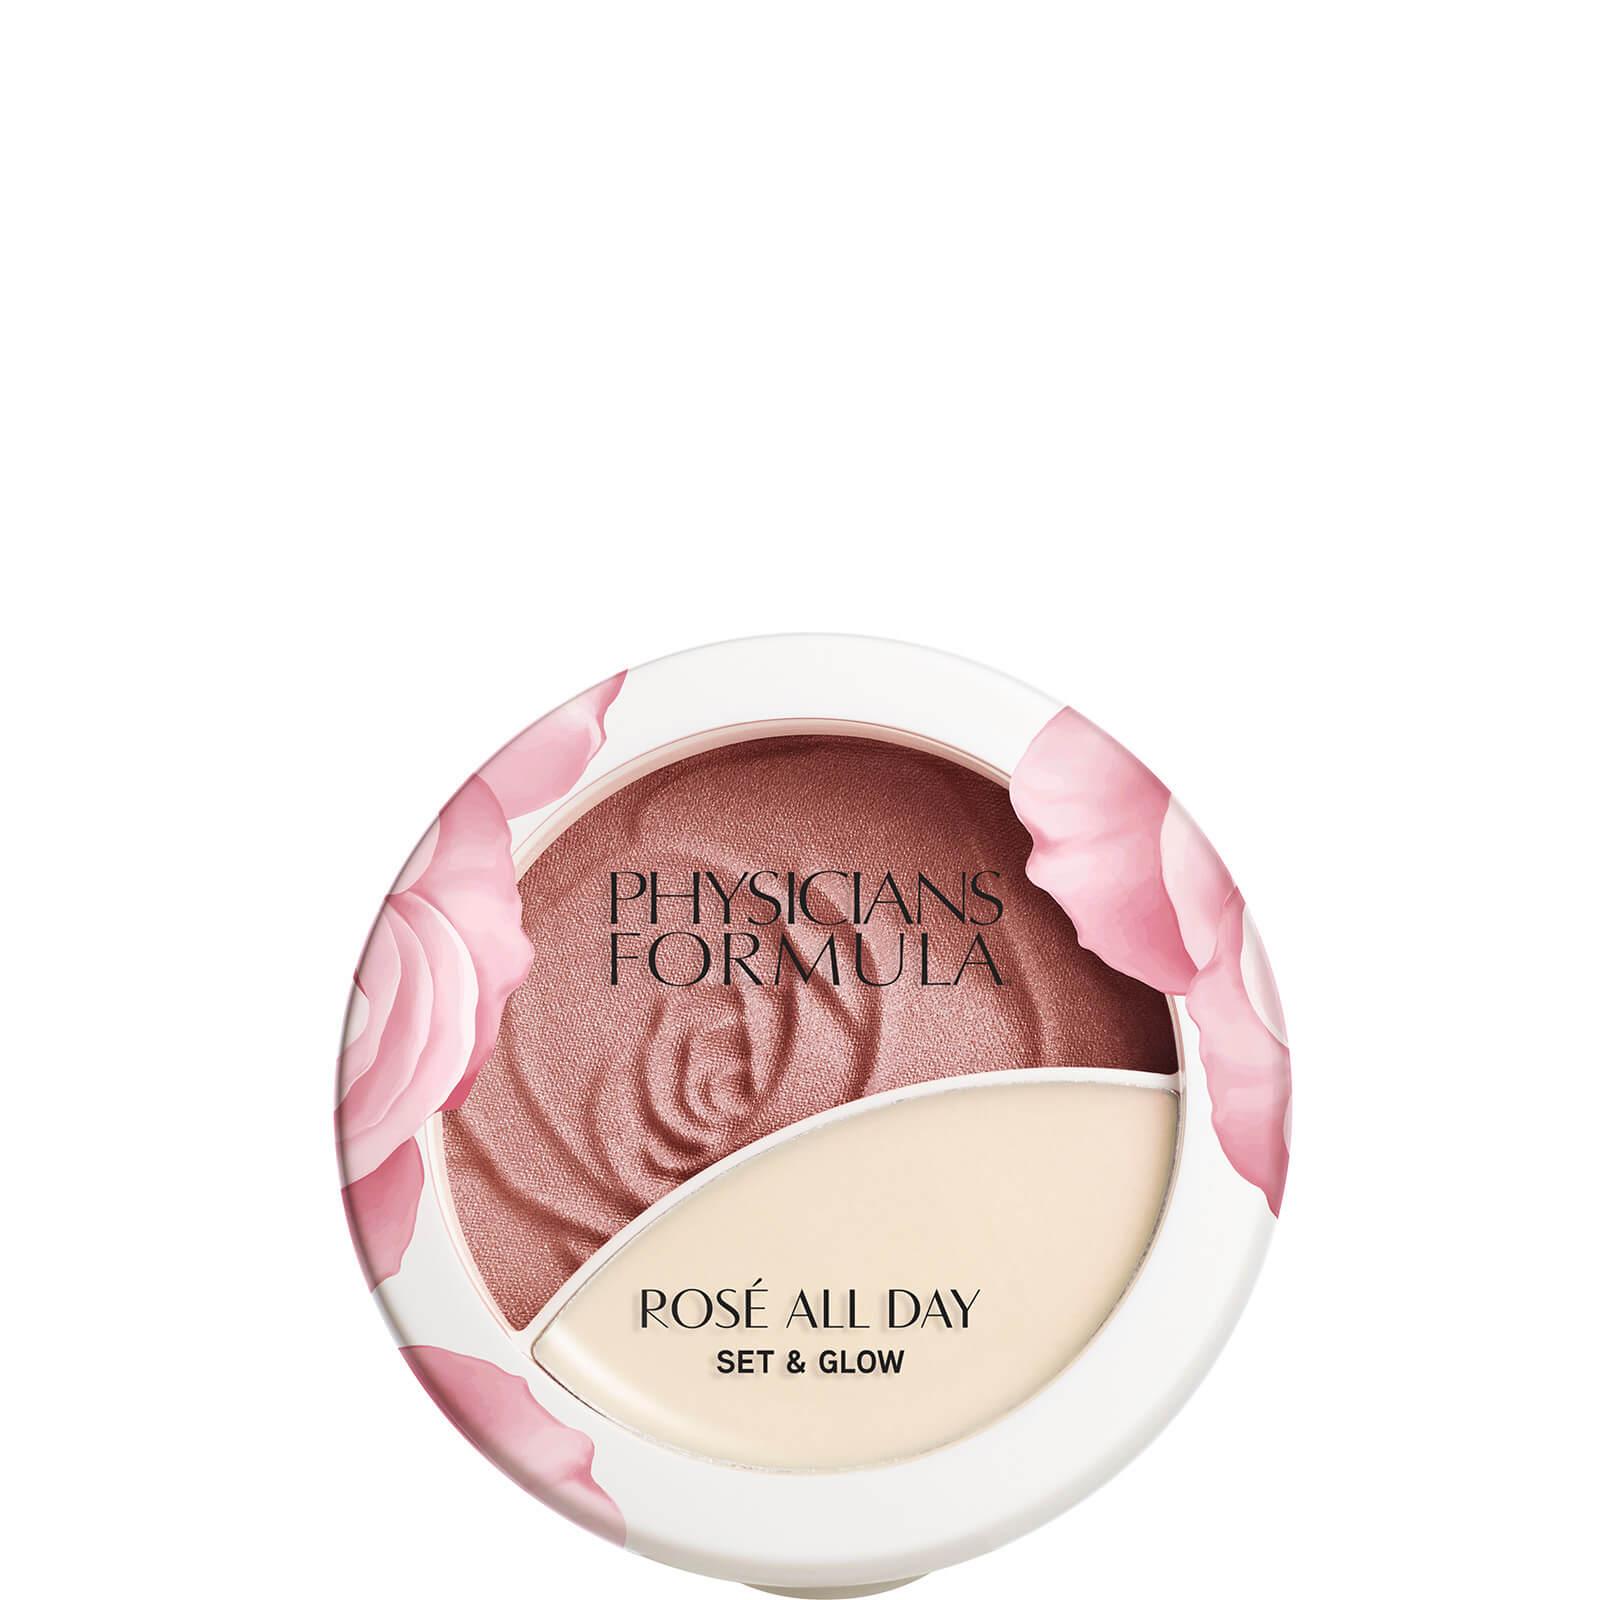 Купить Physicians Formula Rosé All Day Set and Glow 8.3g (Various Shades) - #e3c3bc ||Brightening Rose